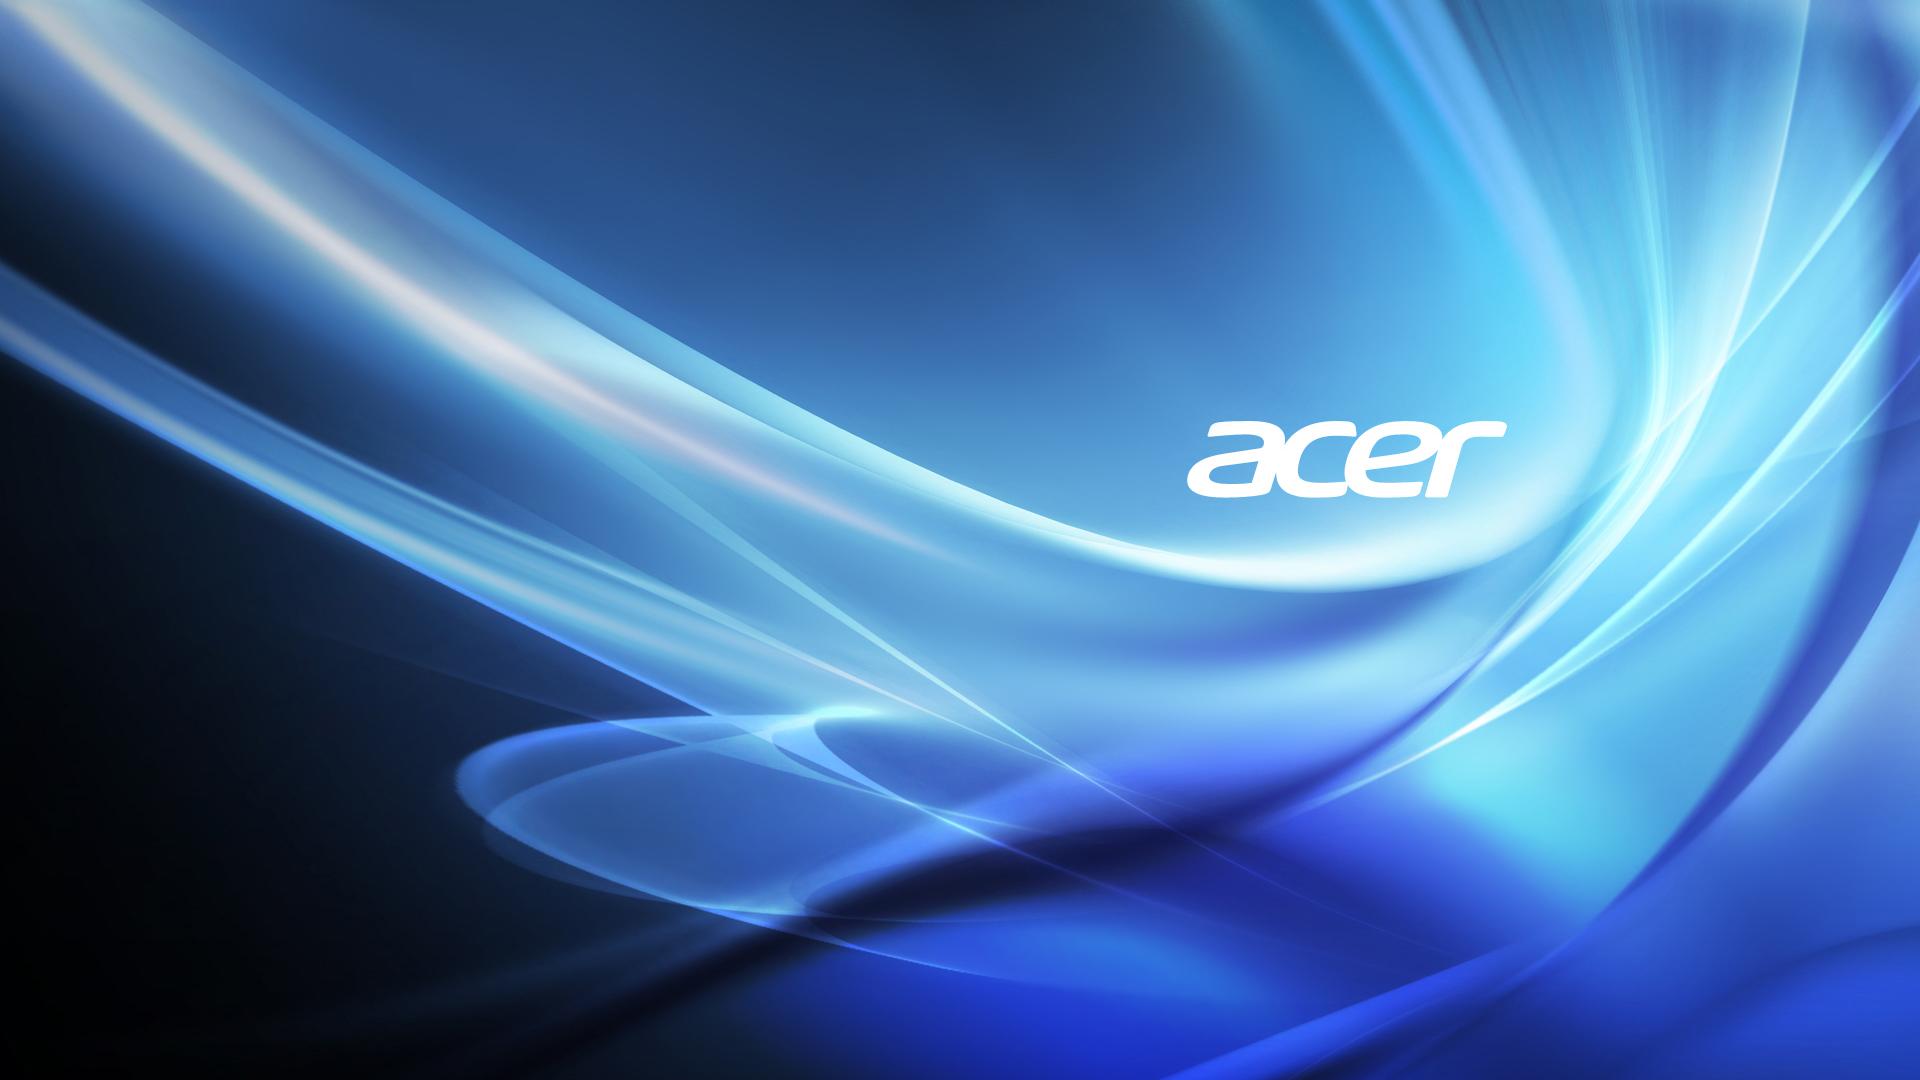 Acer Wallpaper HD   PixelsTalk.Net